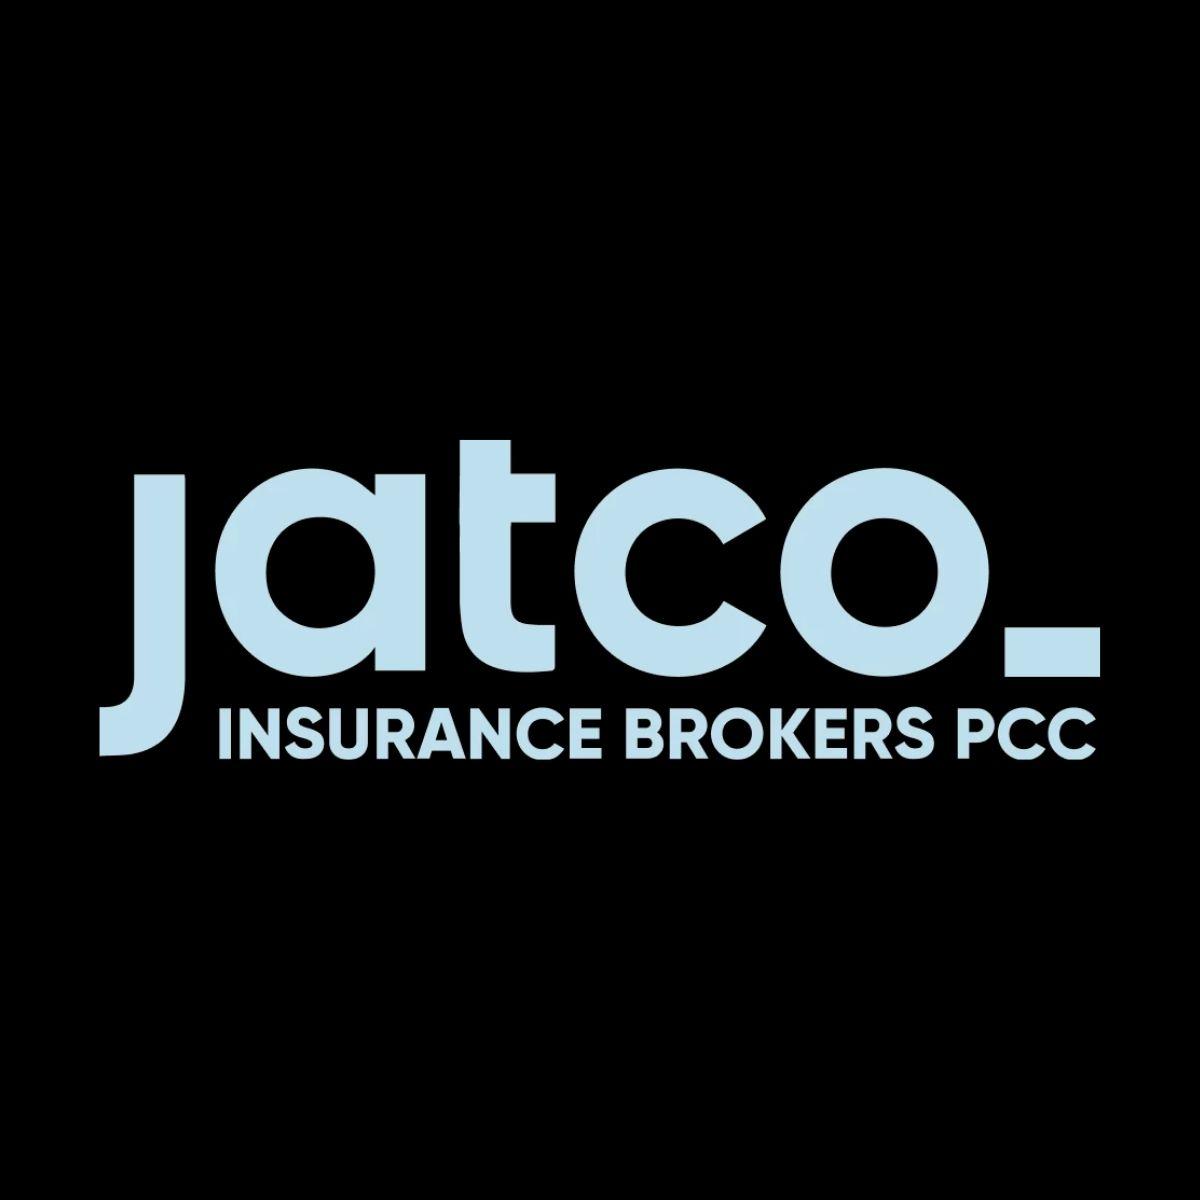 Member Spotlight – Jatco Insurance Brokers PPC Ltd: With Lloyd's Broker Status, Jatco Plots Expansion